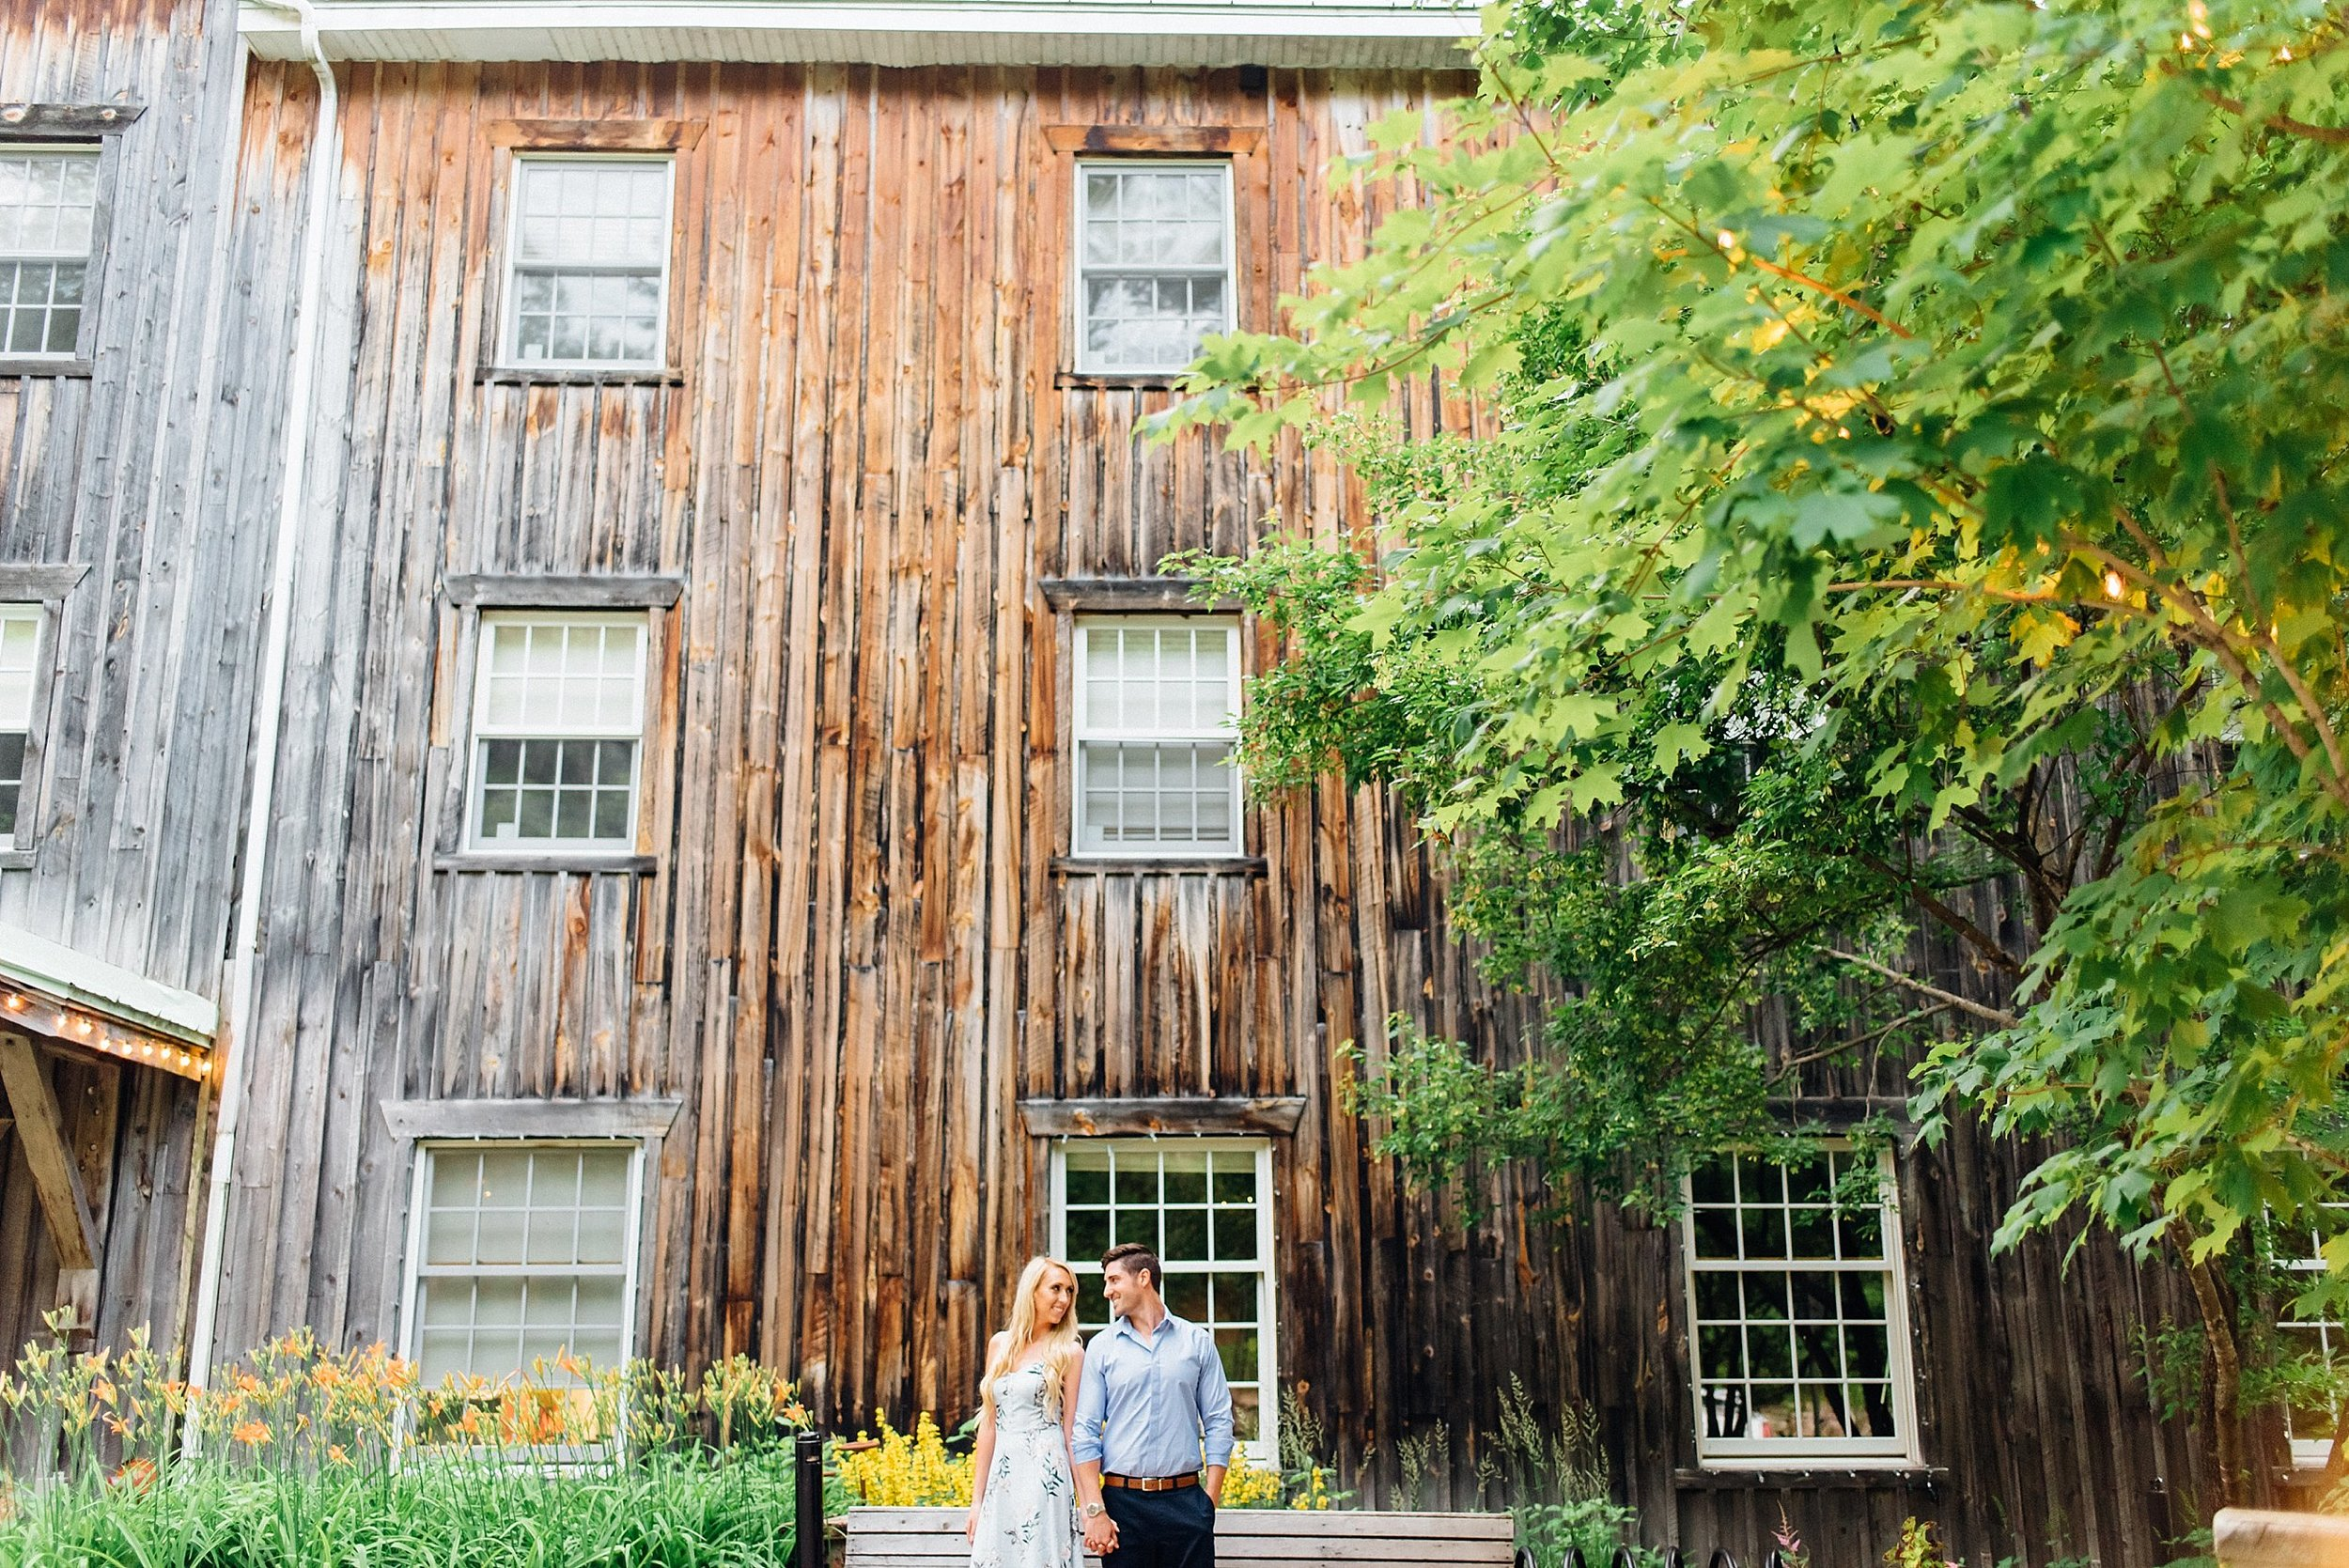 Ali and Batoul Photography - light, airy, indie documentary Ottawa wedding photographer_0059.jpg